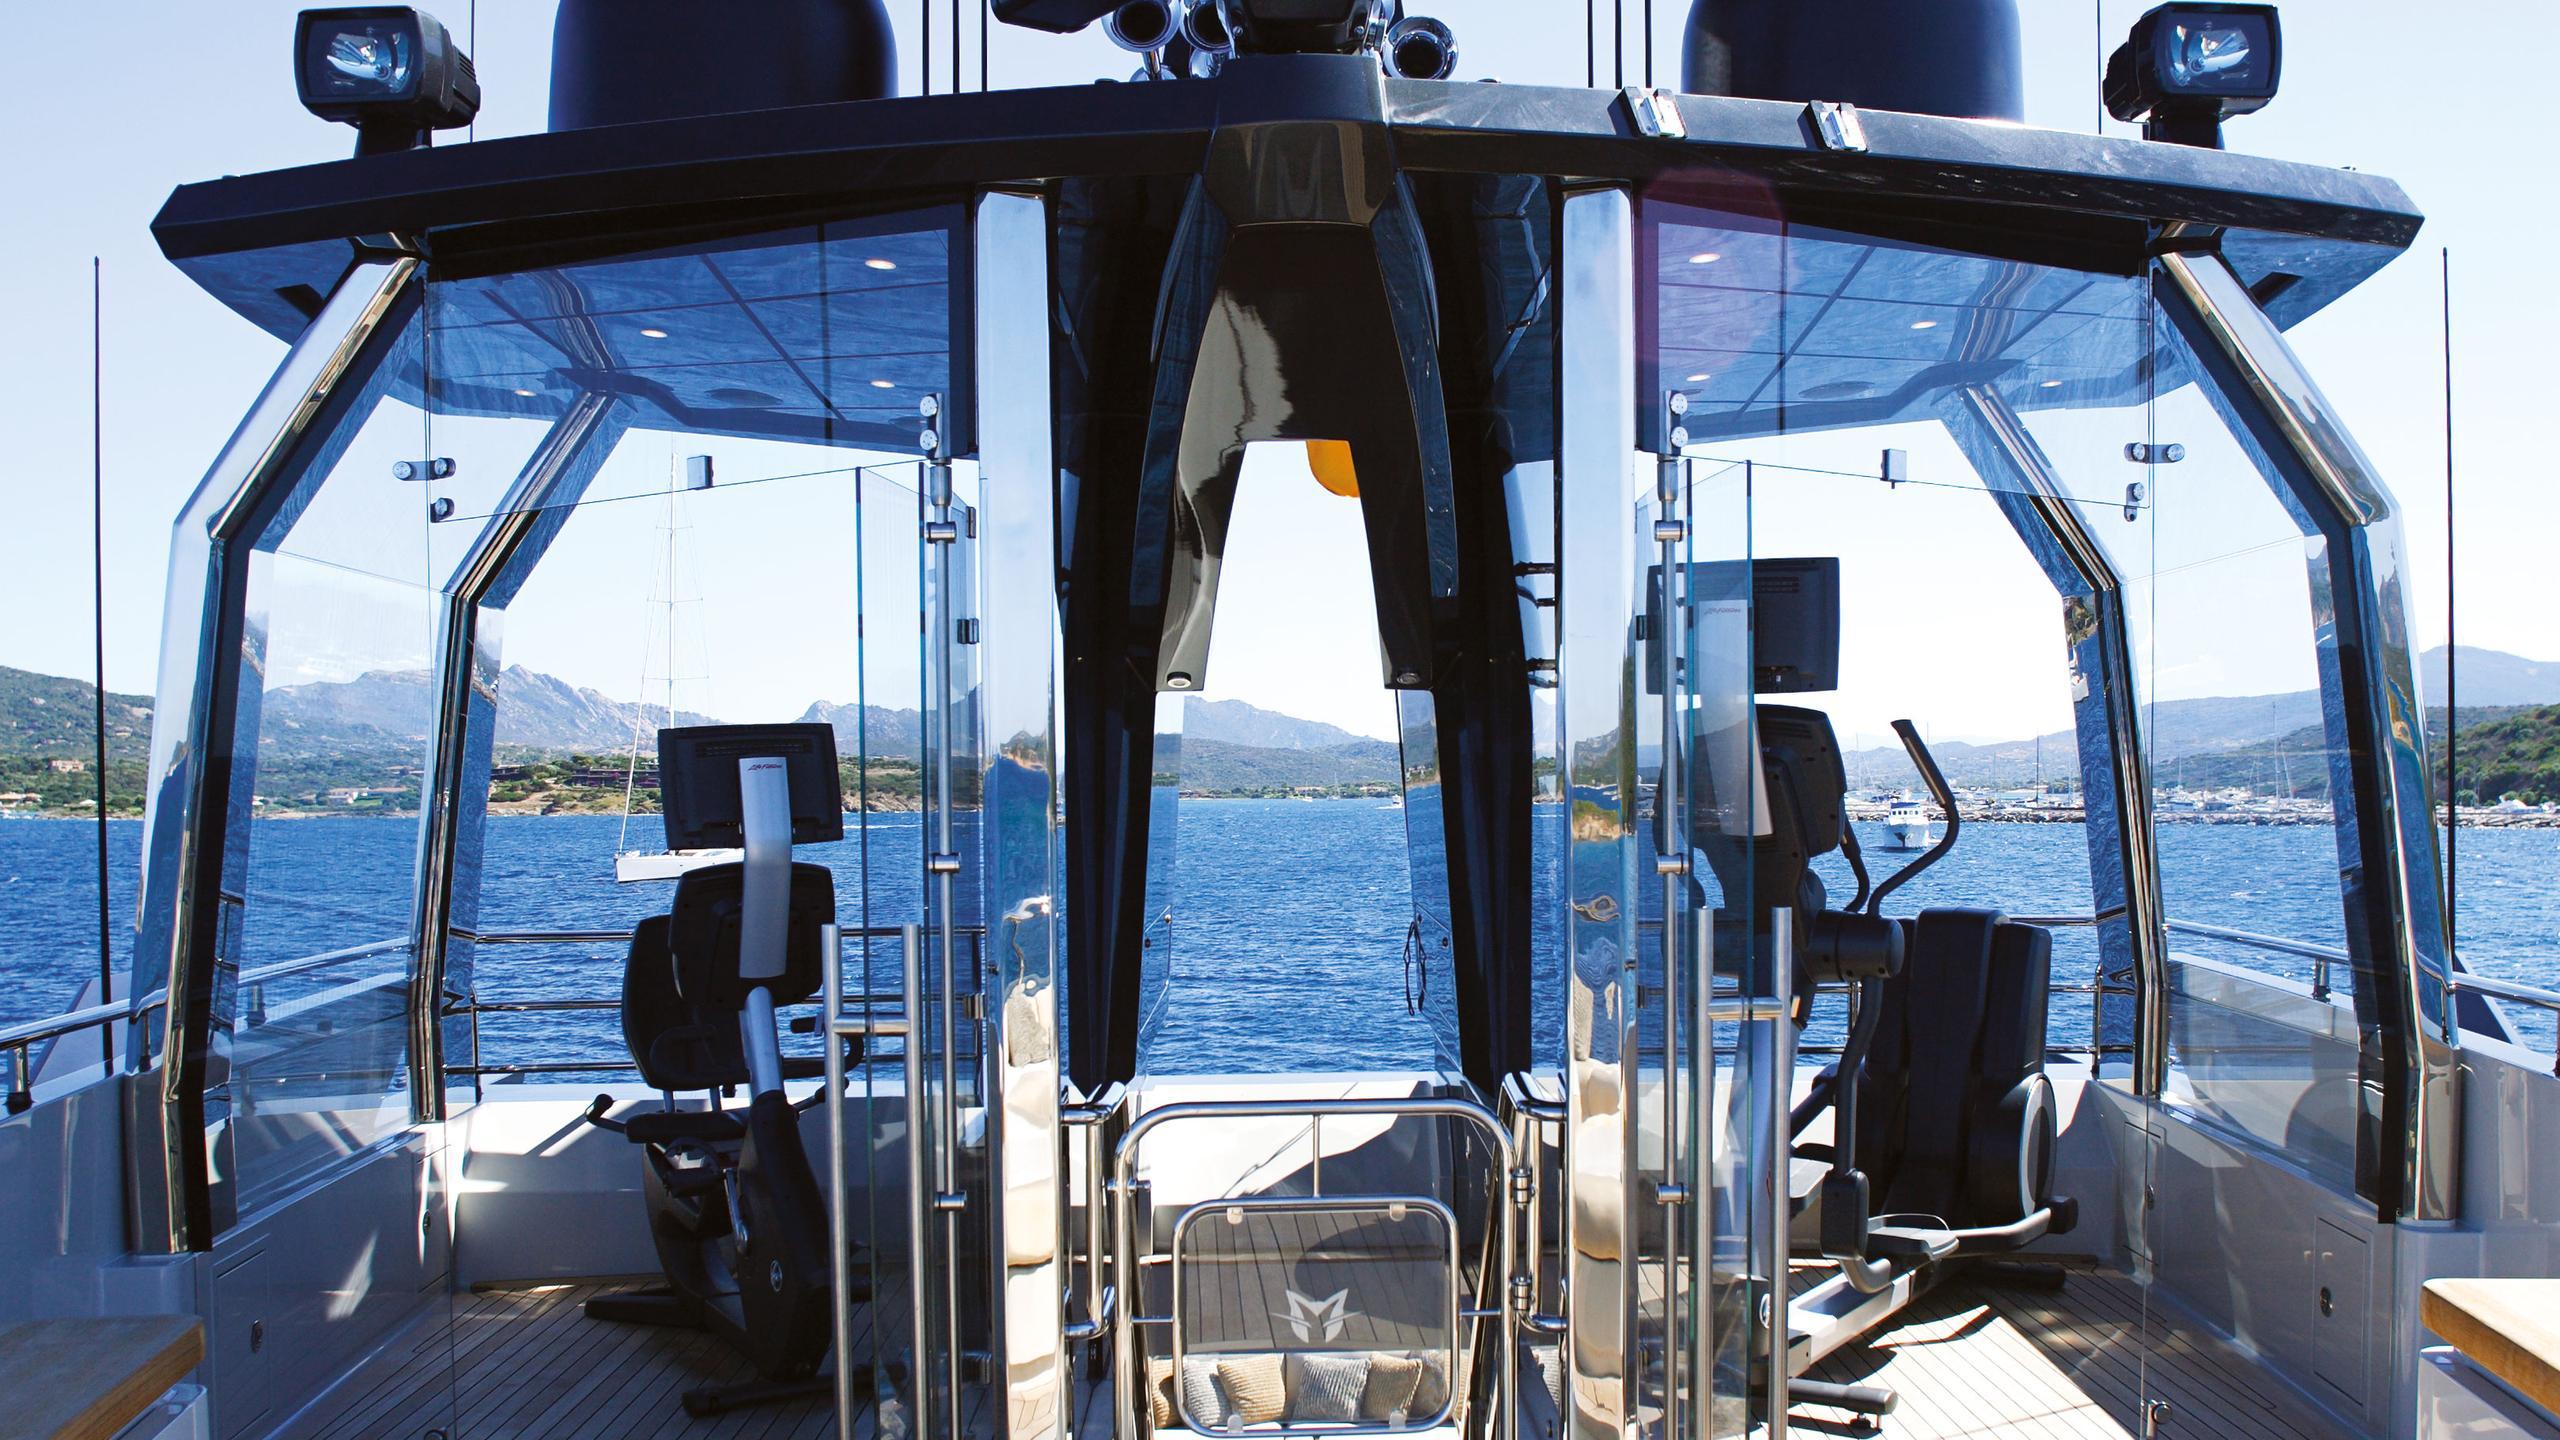 lady-m-motor-yacht-palmer-johnson-2013-64m-flybridge-gym